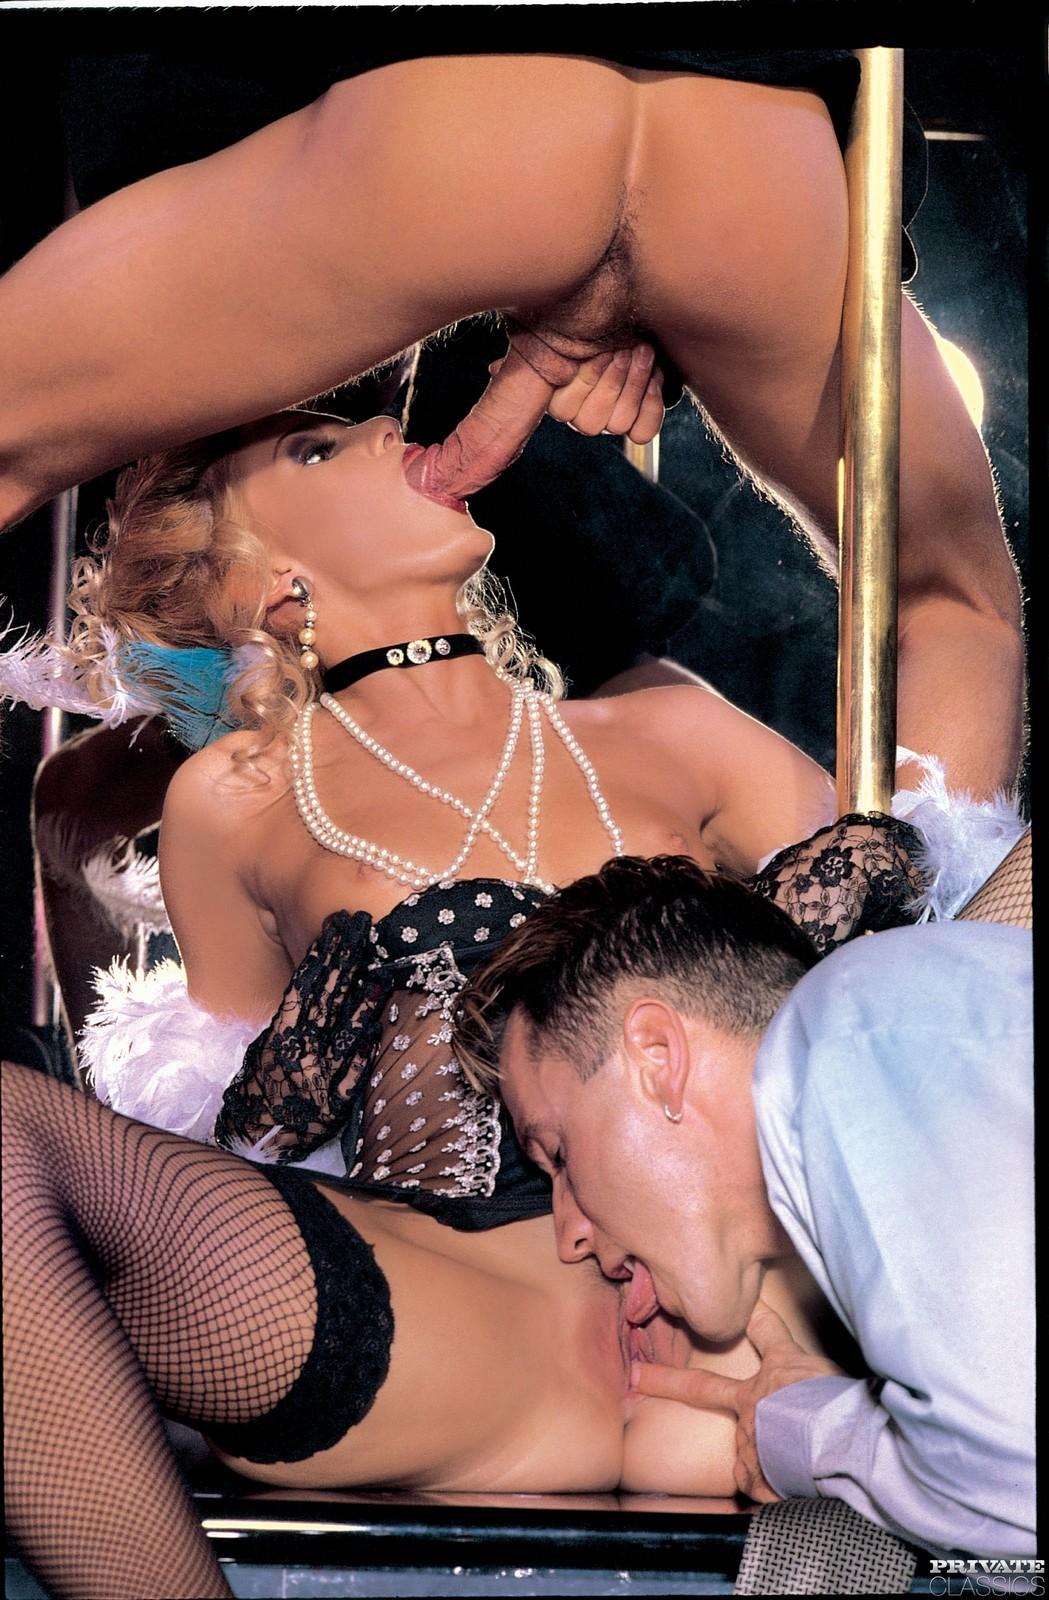 Glamour celeb sex — pic 14